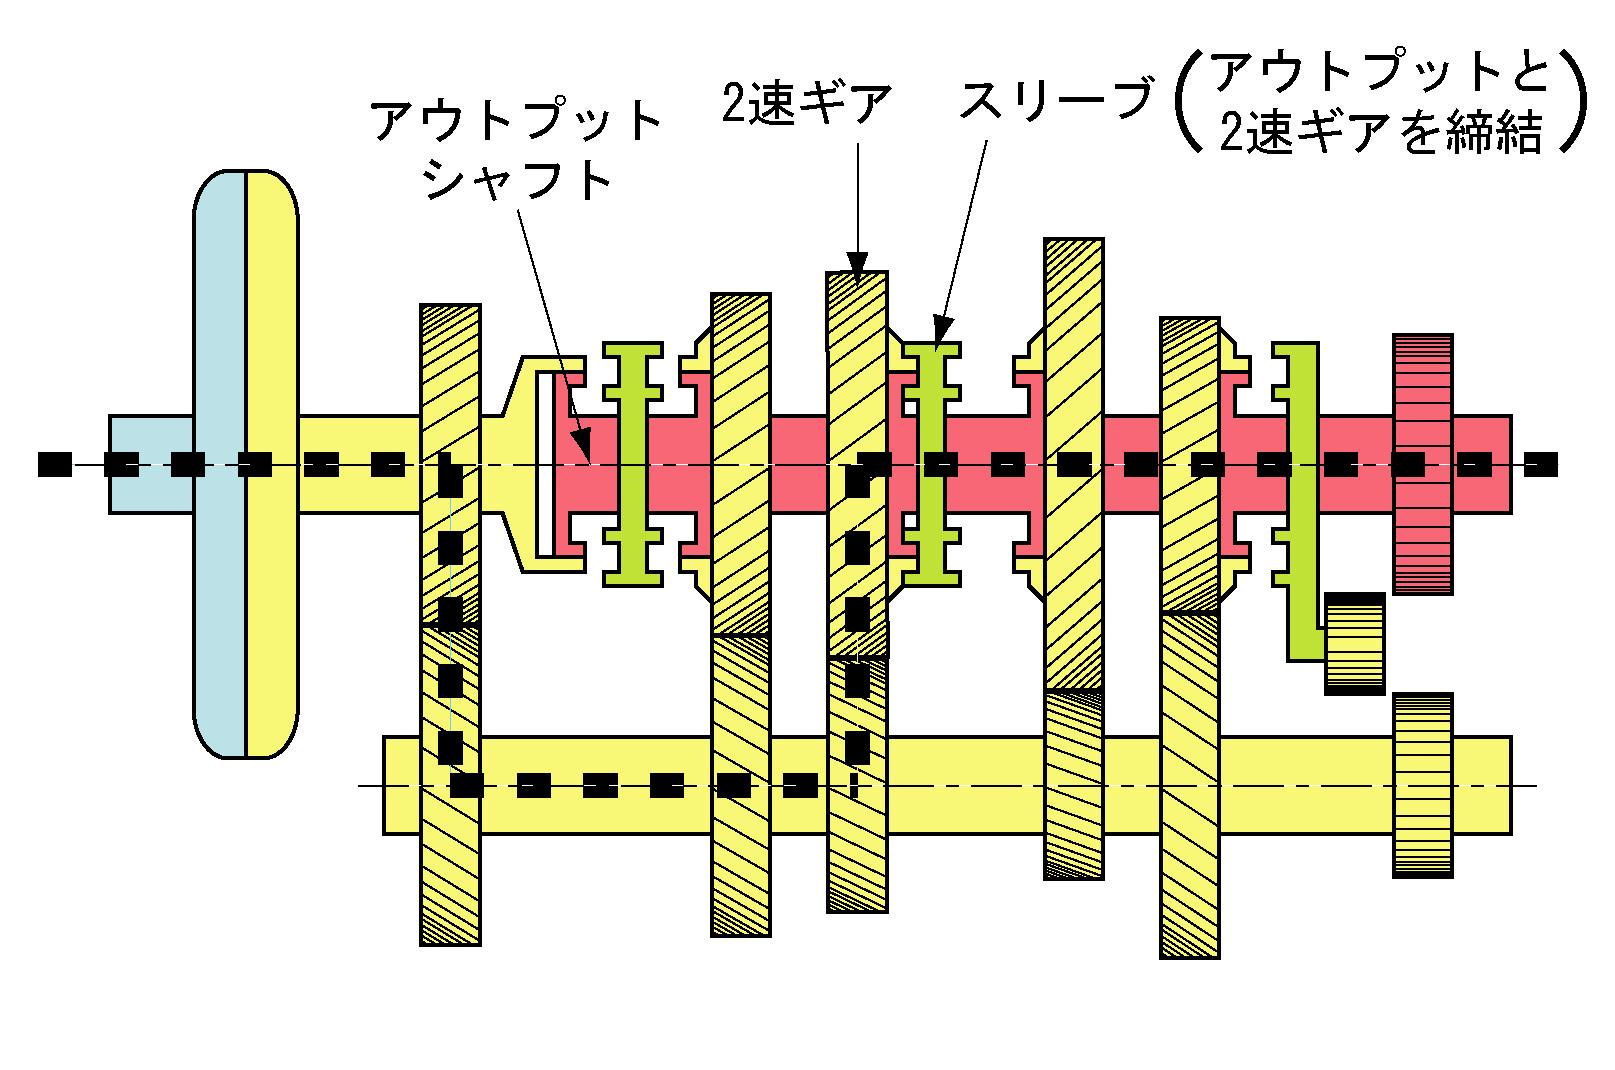 file manual transmission in 2nd gear jpg wikimedia commons rh commons wikimedia org manual transmission dei Manual Transmission Diagram